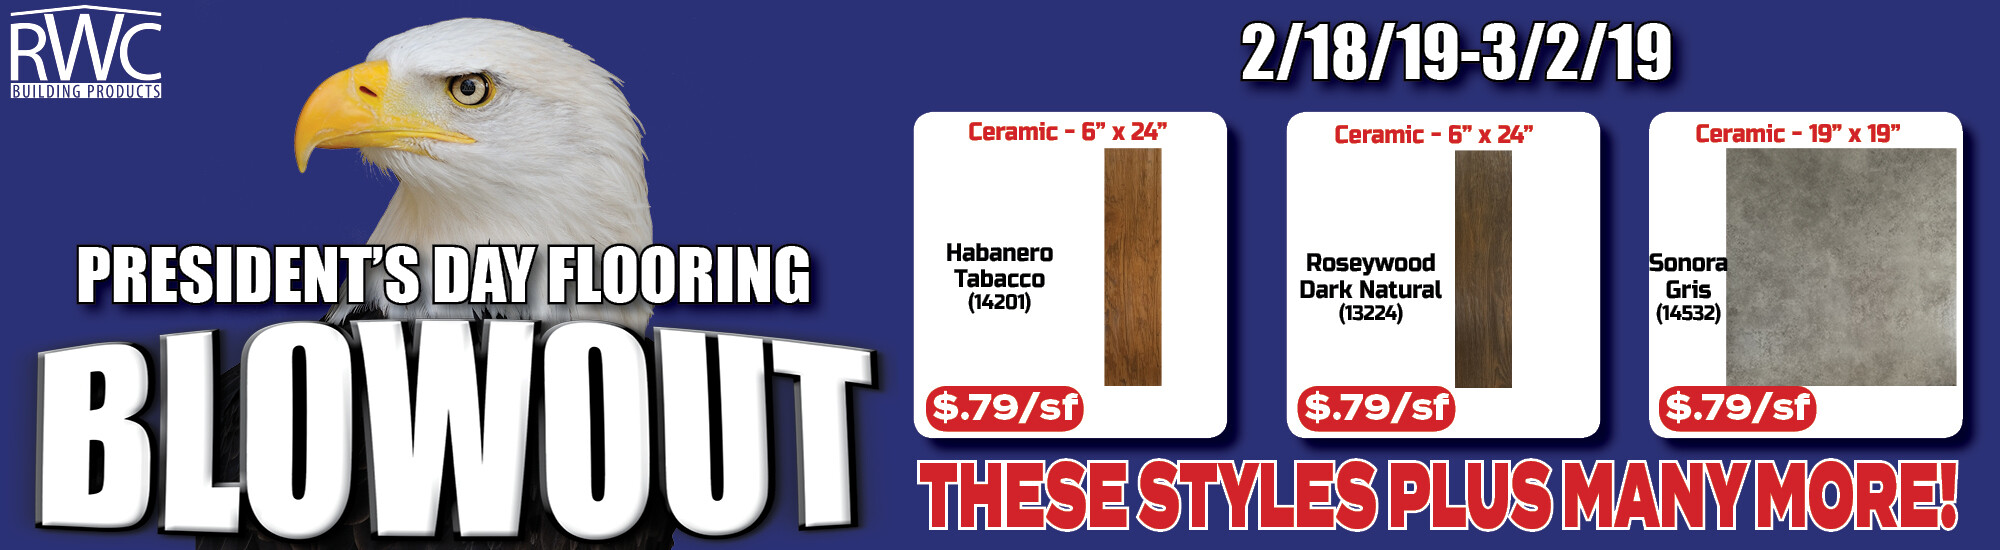 Flooring-2.19-Web-Slide